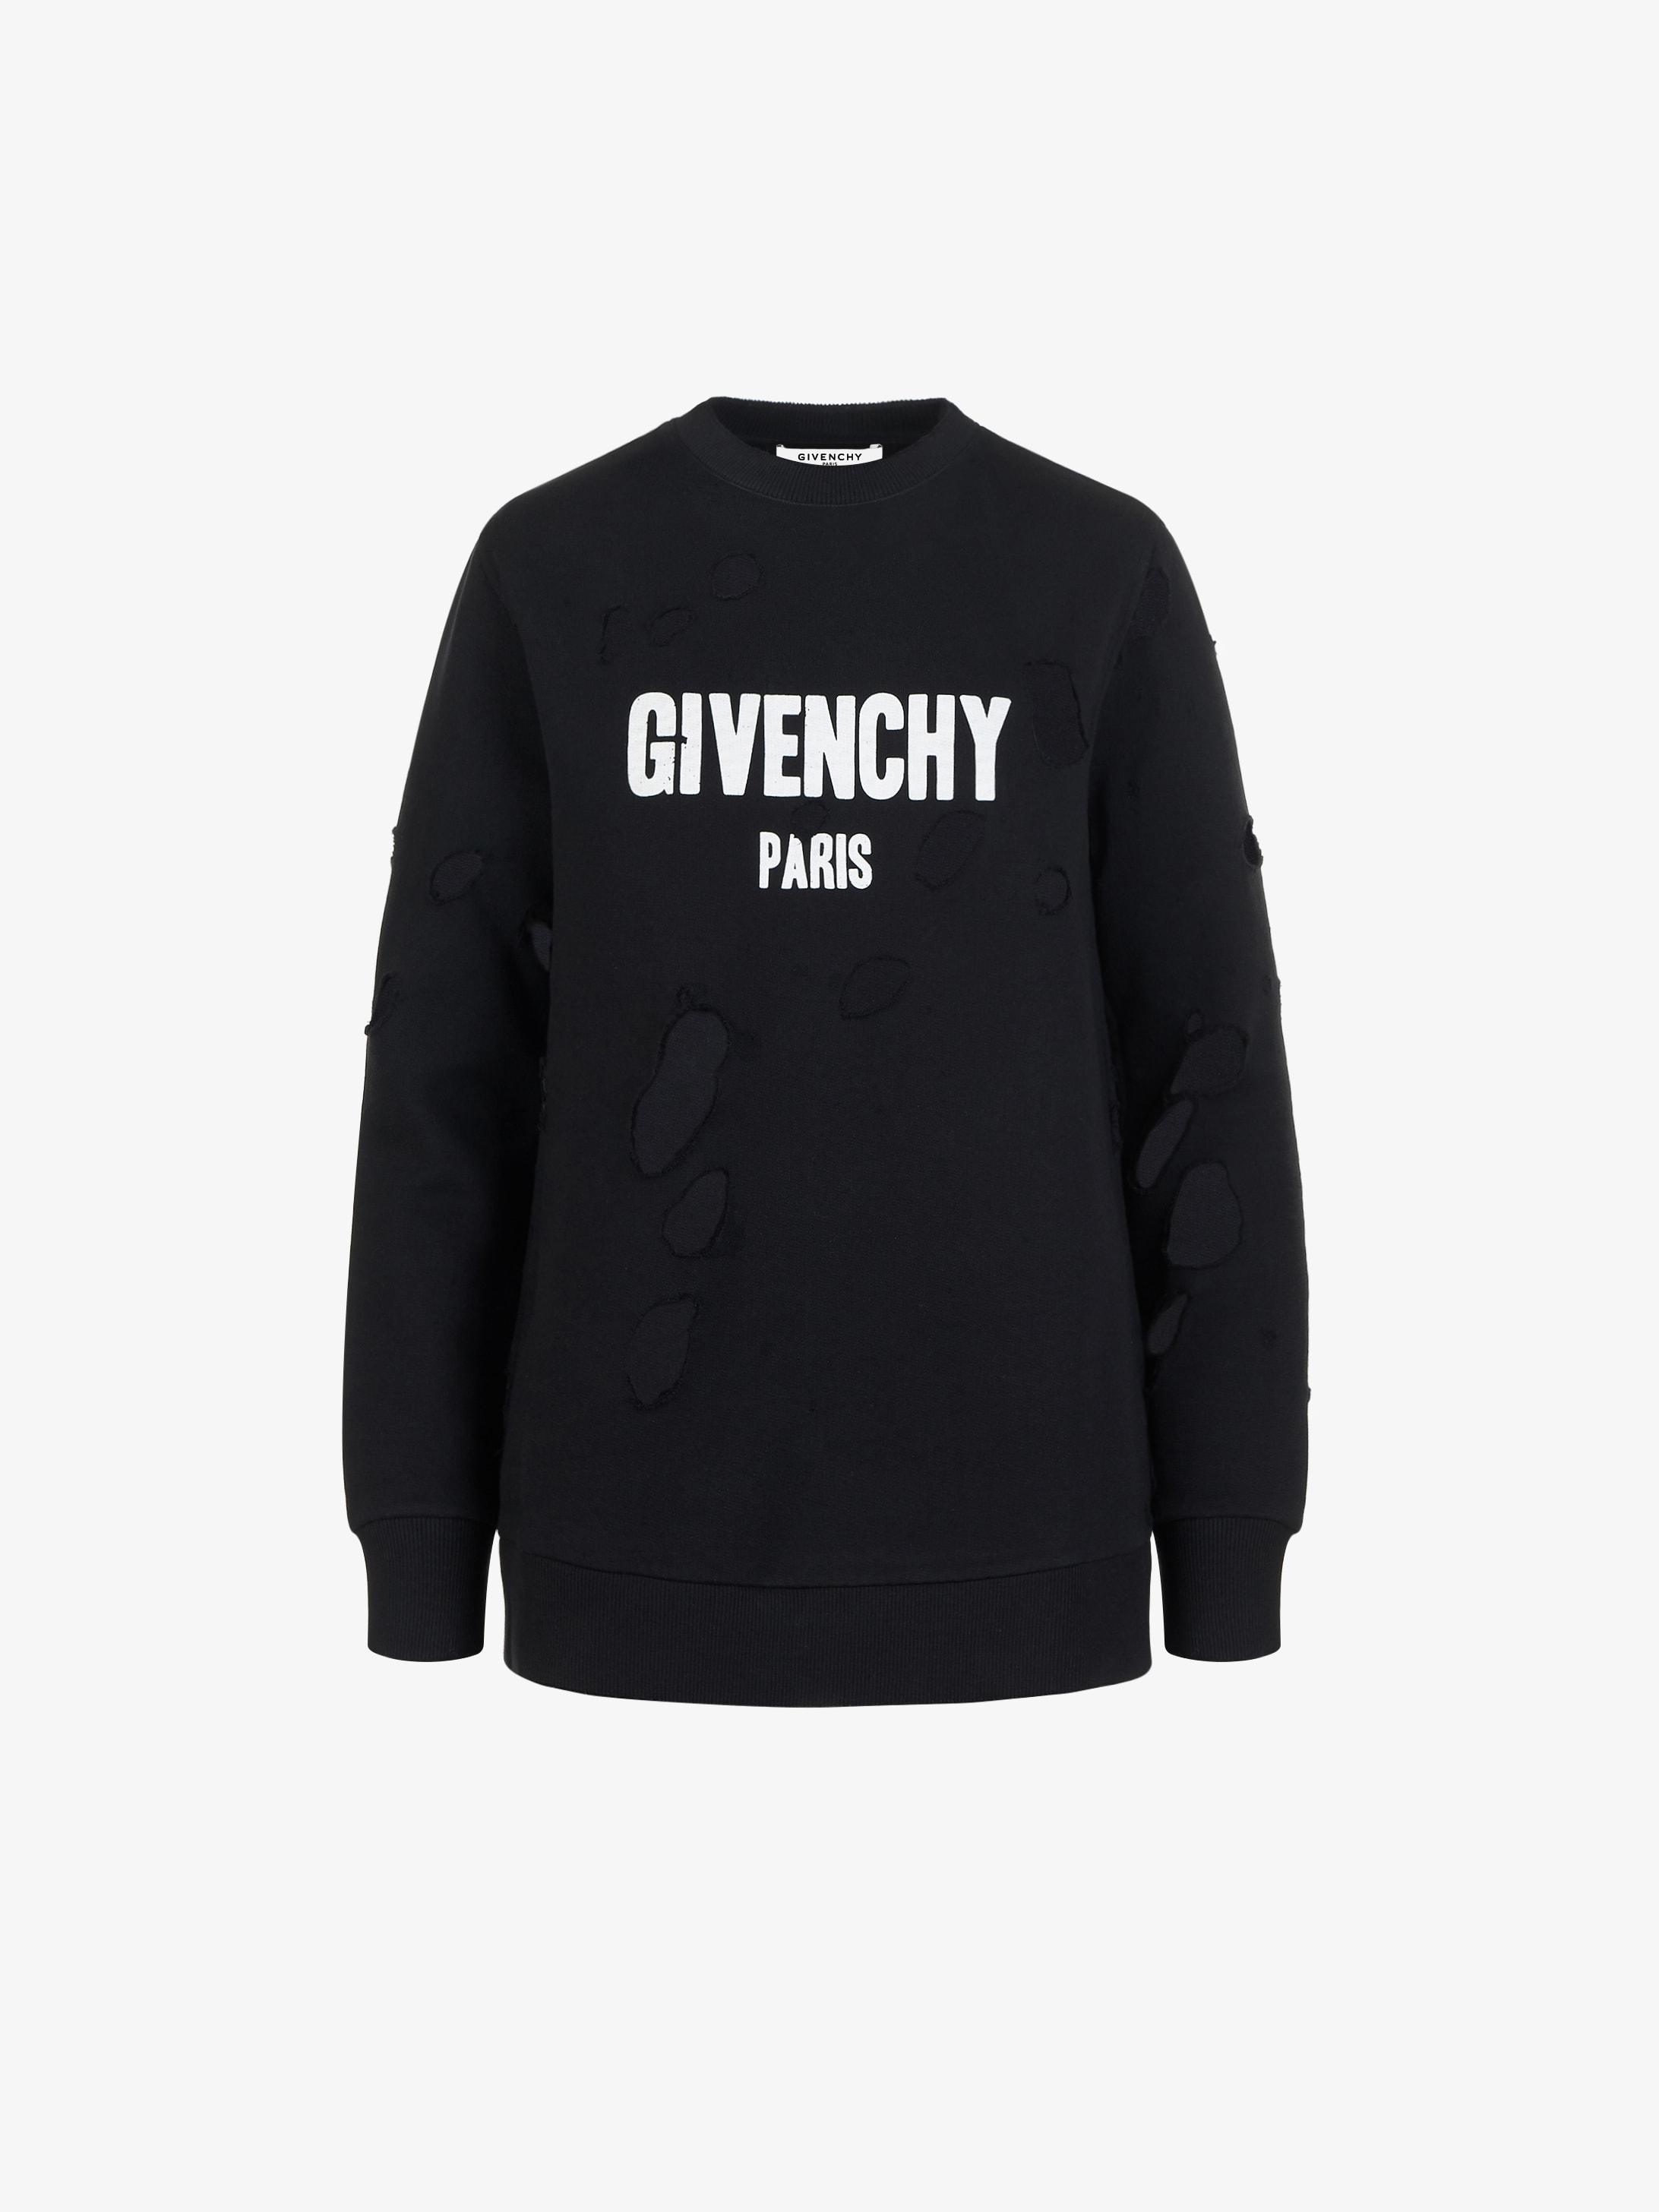 Givenchy Sweatshirt Givenchy Destroyed Paris Destroyed Paris qYUE0